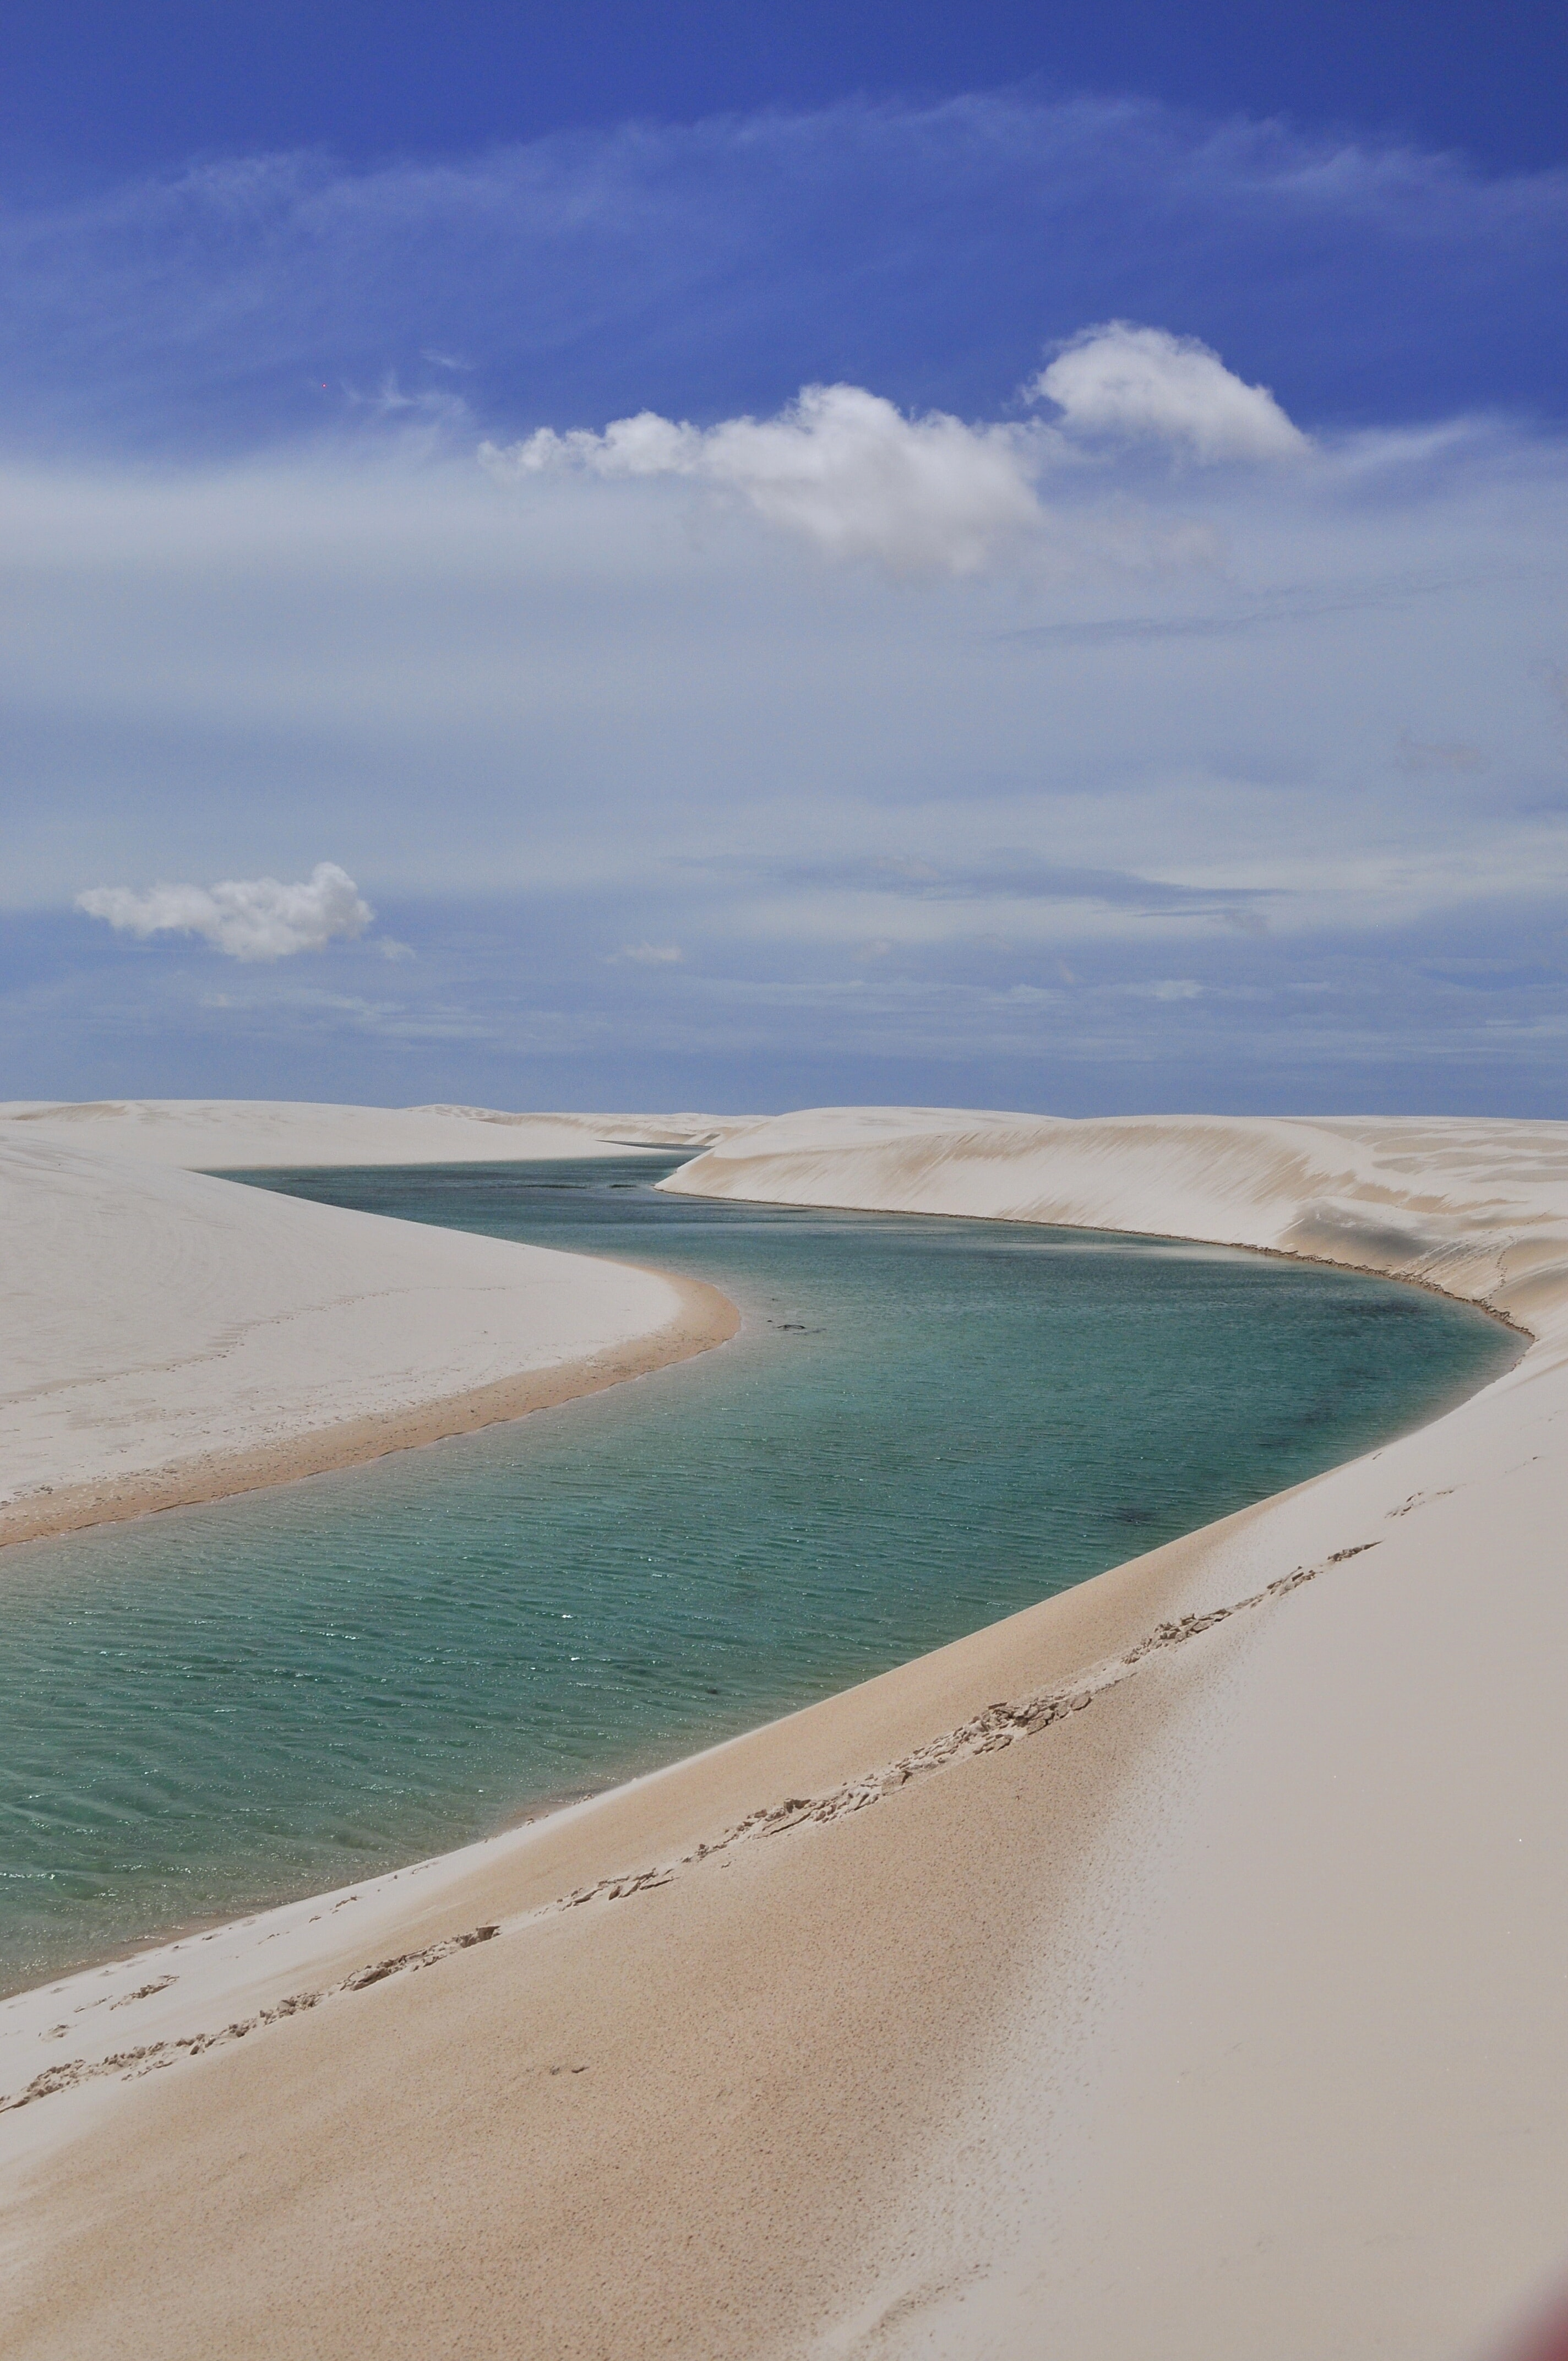 body of water between sand under cloudy sky